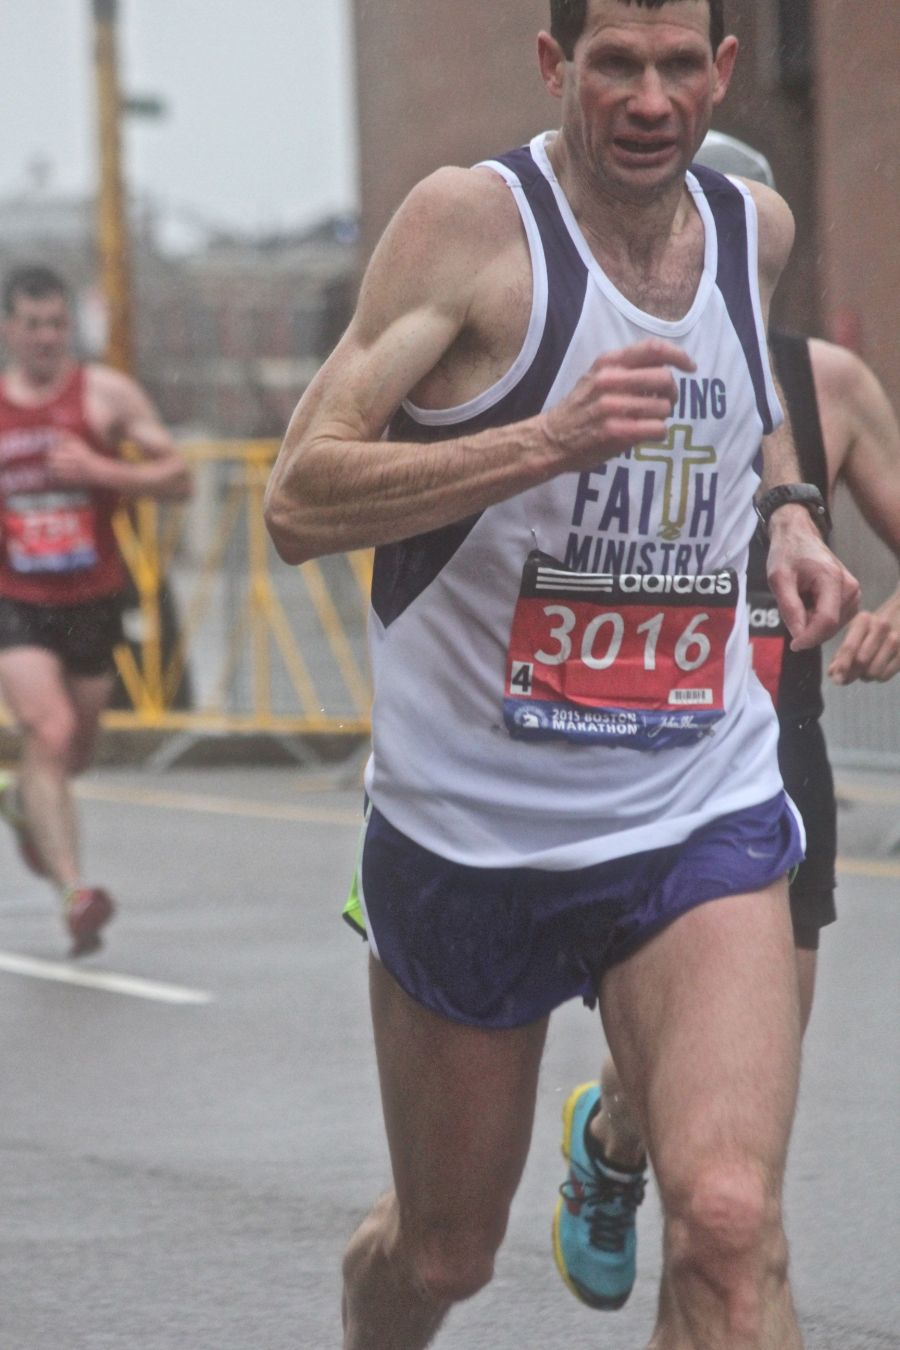 boston marathon april 20 2015 racer number 3019